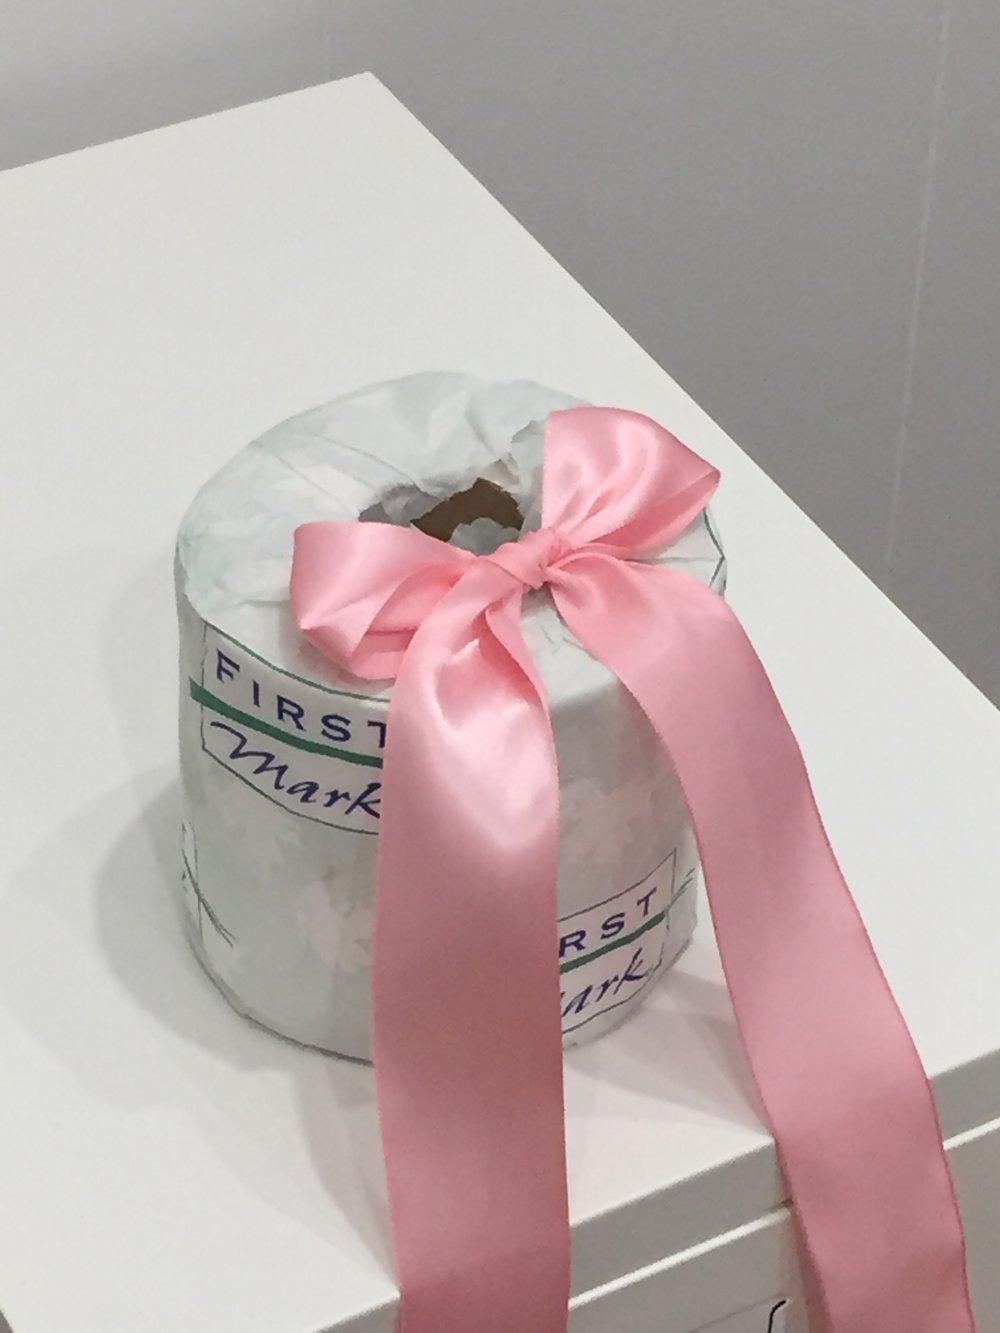 Toilet Paper, Ribbon, Filing Cabinet